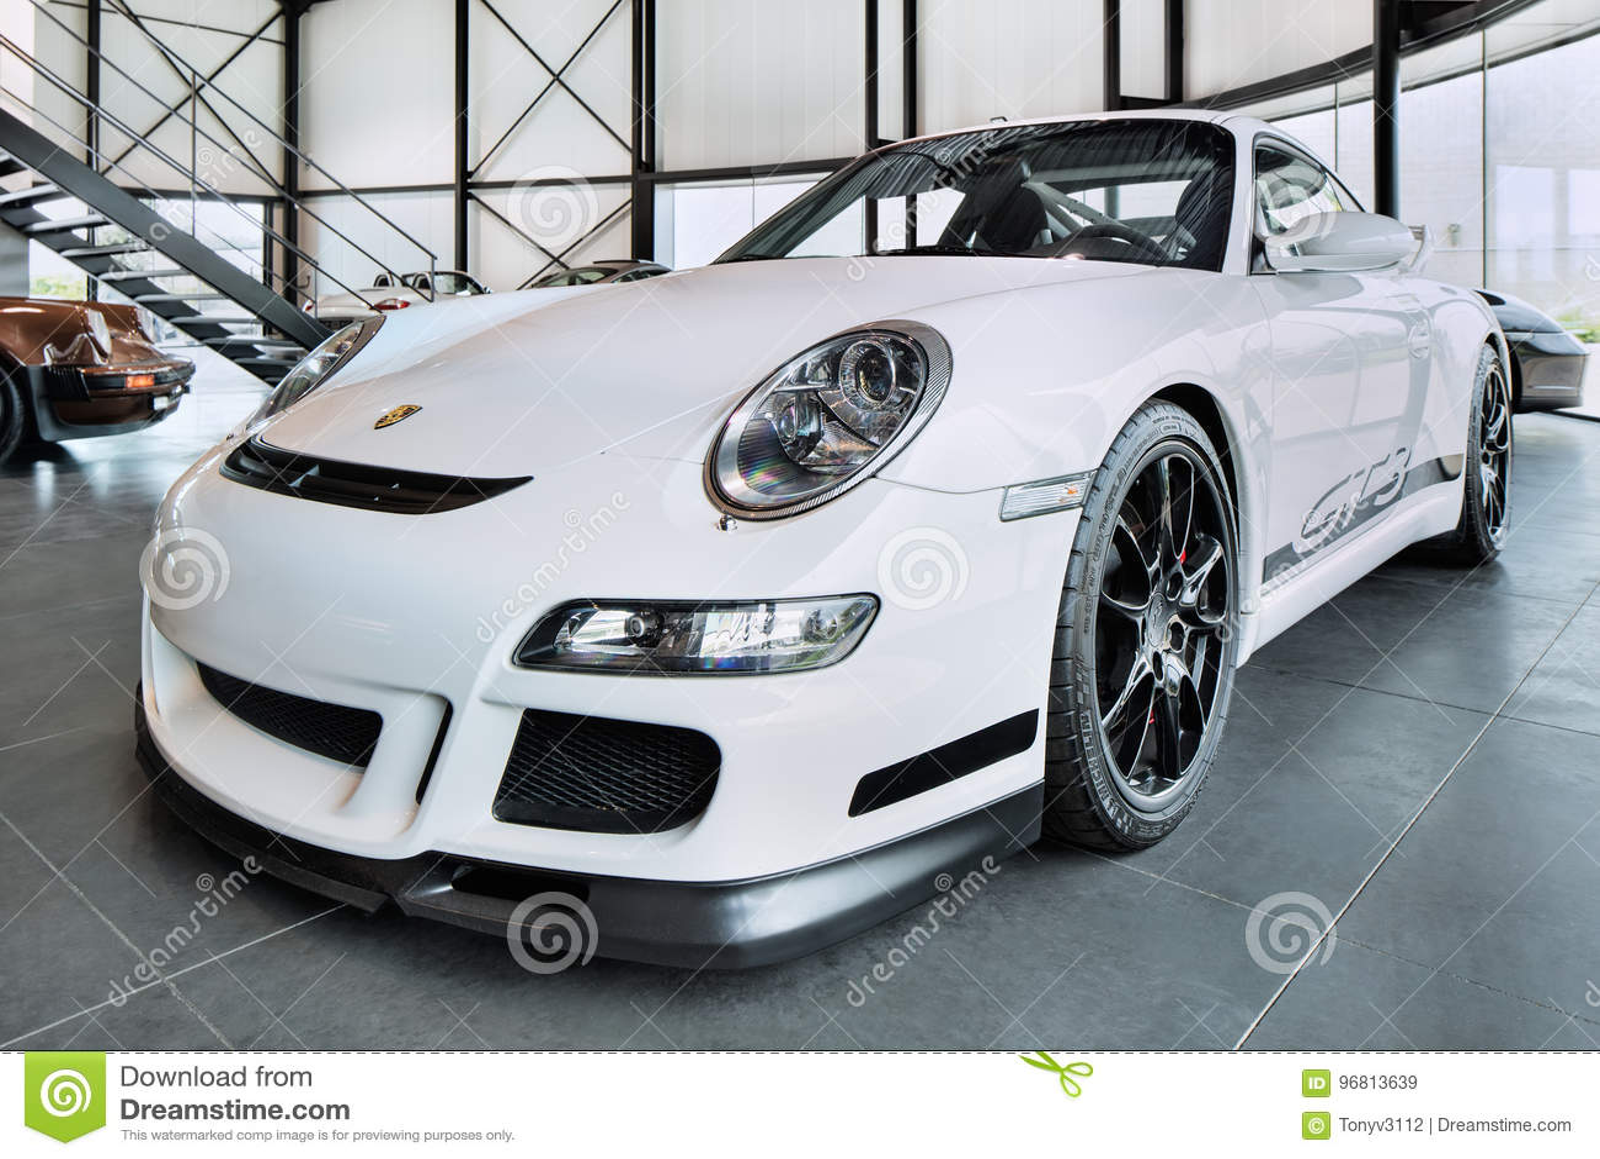 Porsche 911 Gt3 Street Legal Race Car Popular For Track Days On